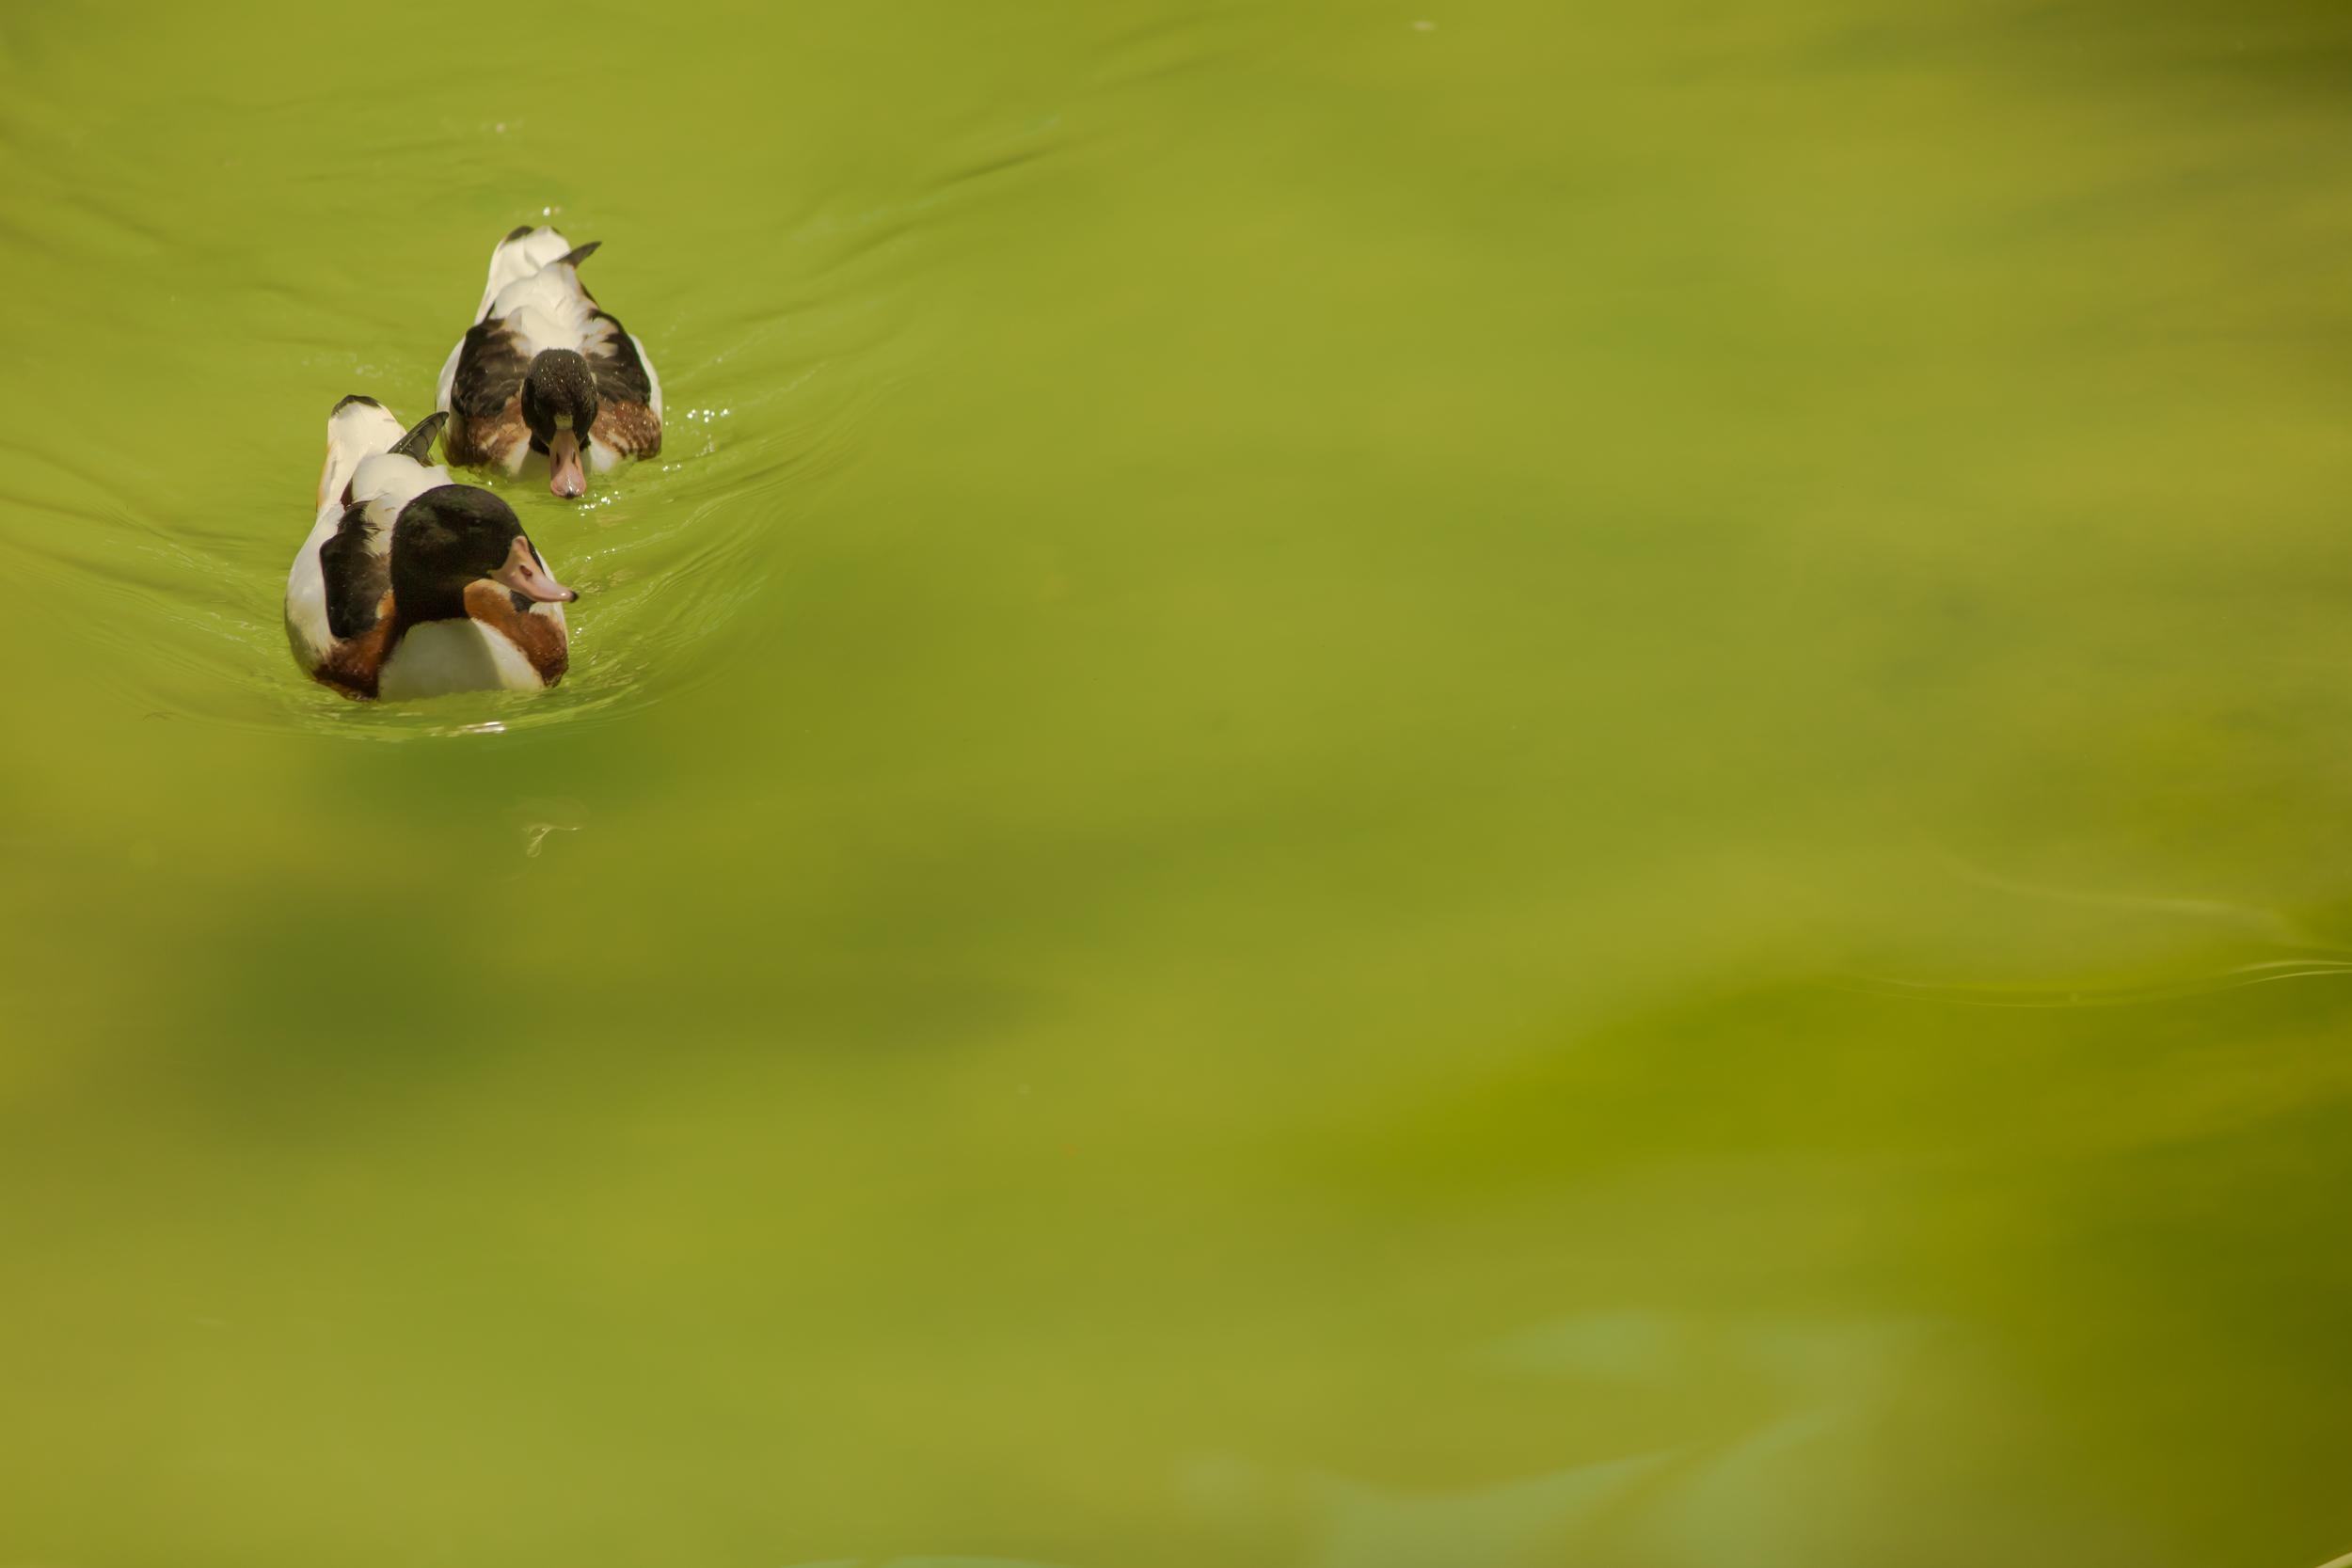 ducks_14433063485_o.jpg